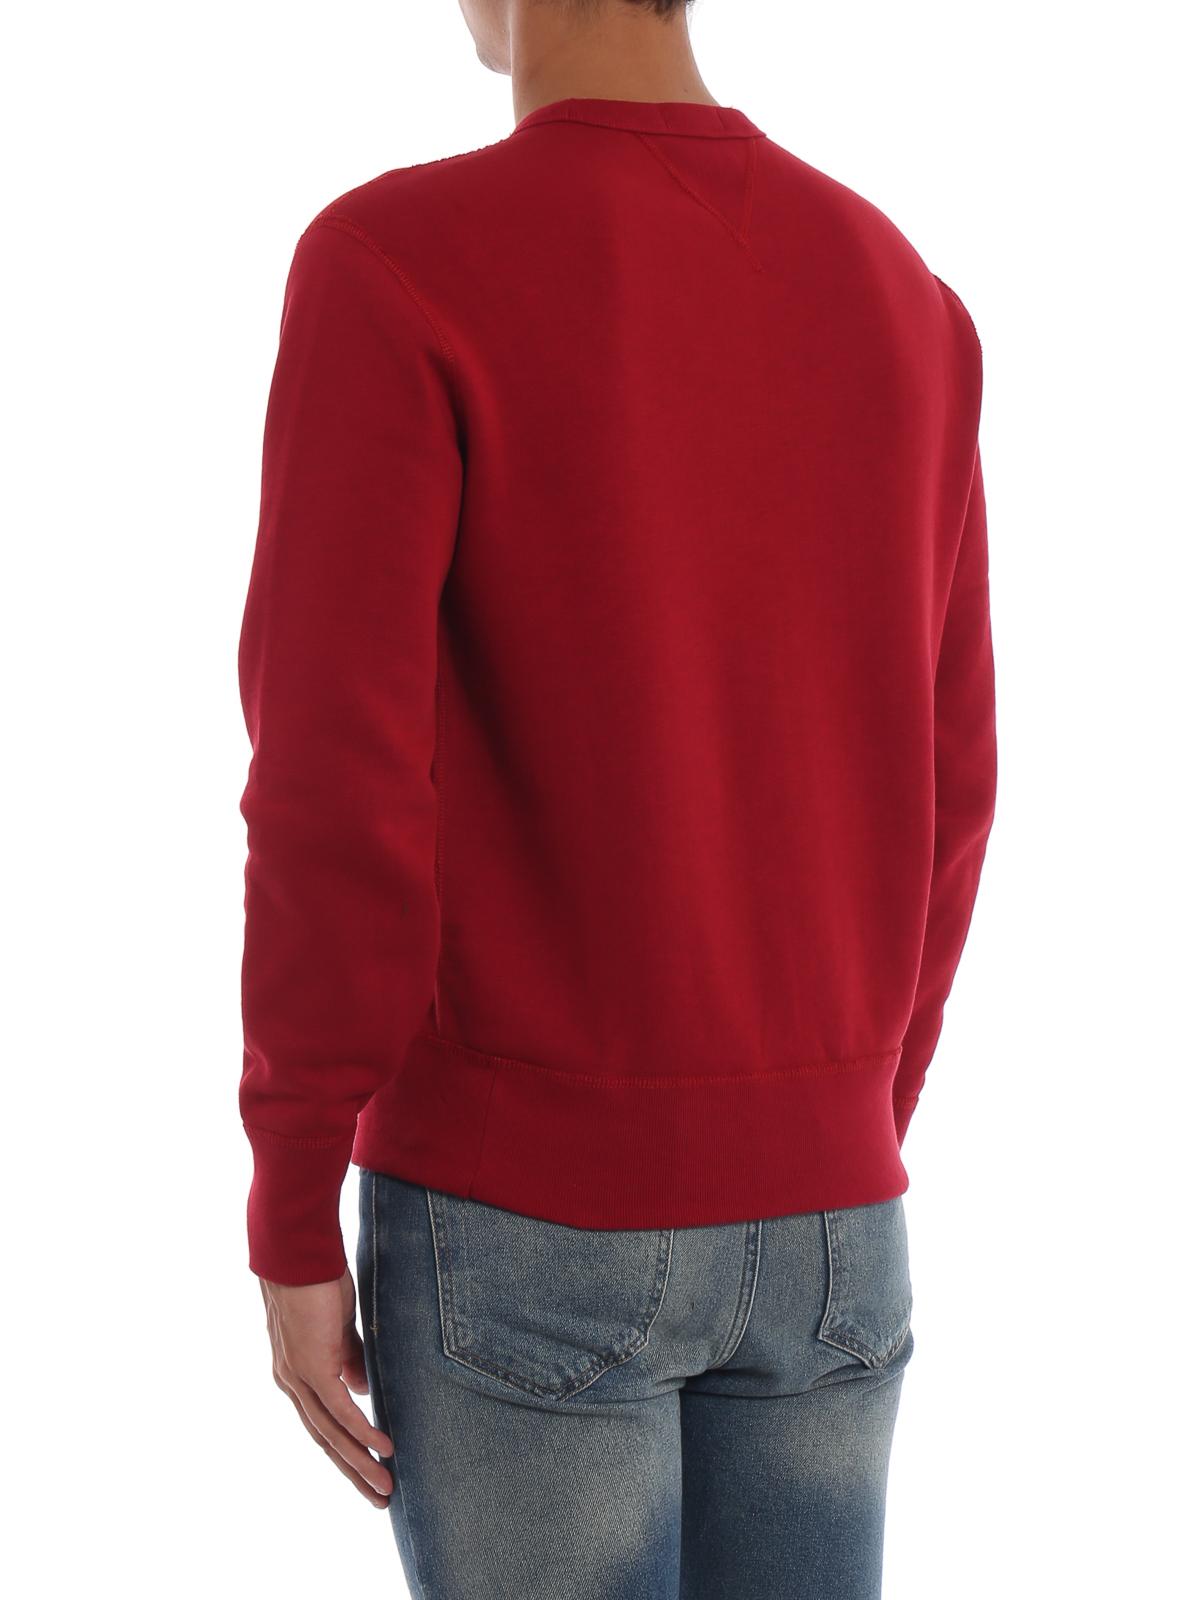 Polo Ralph Lauren - Polo 1967 red sweatshirt - Sweatshirts ... 1bc05cadbb9d